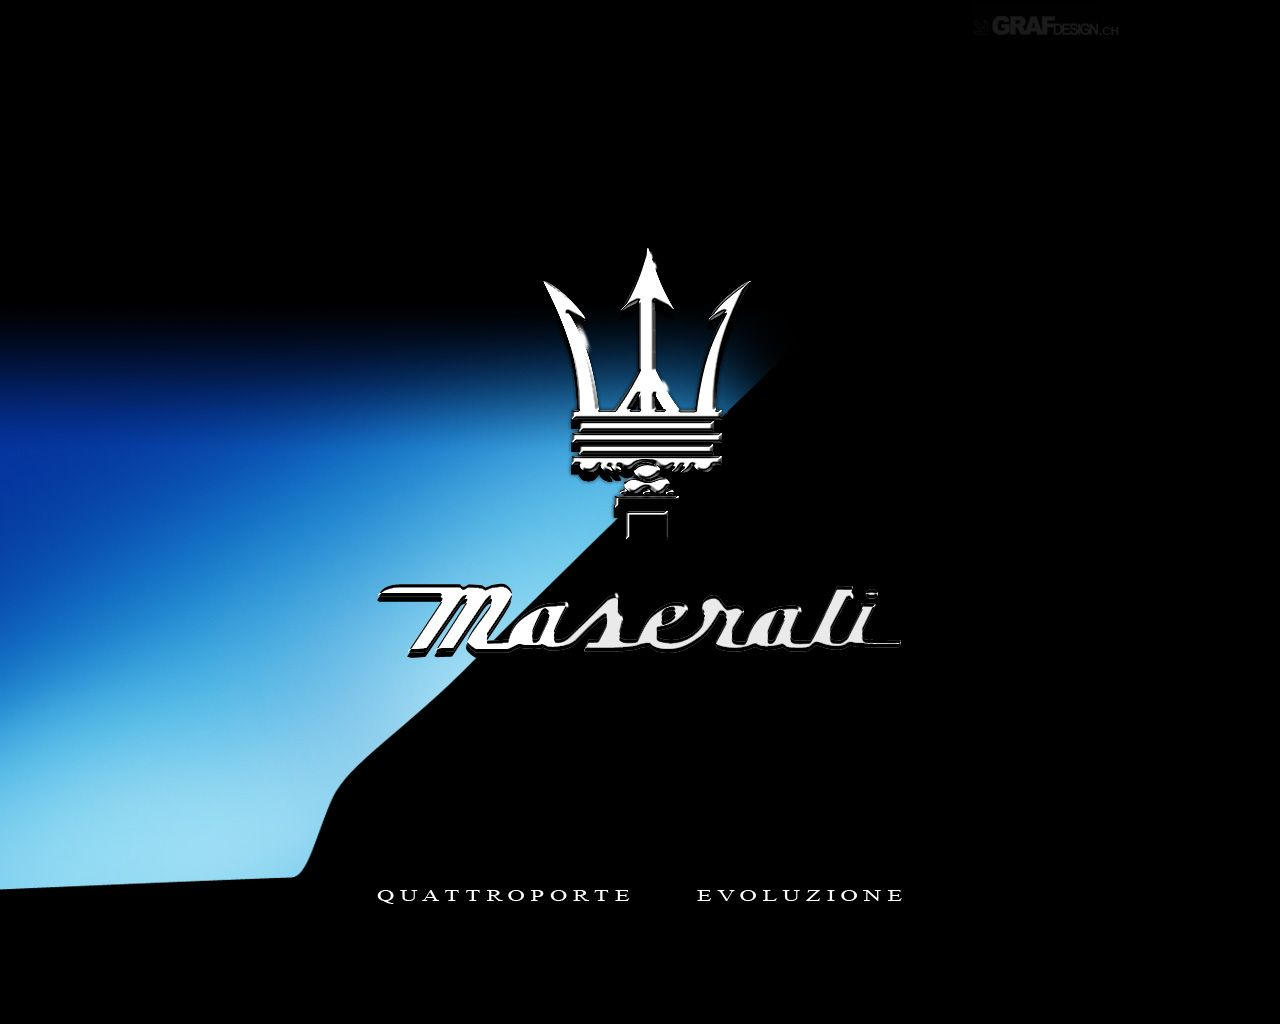 Maserati Logo Wallpaper Maserati Logotipo Carros 1280x1024